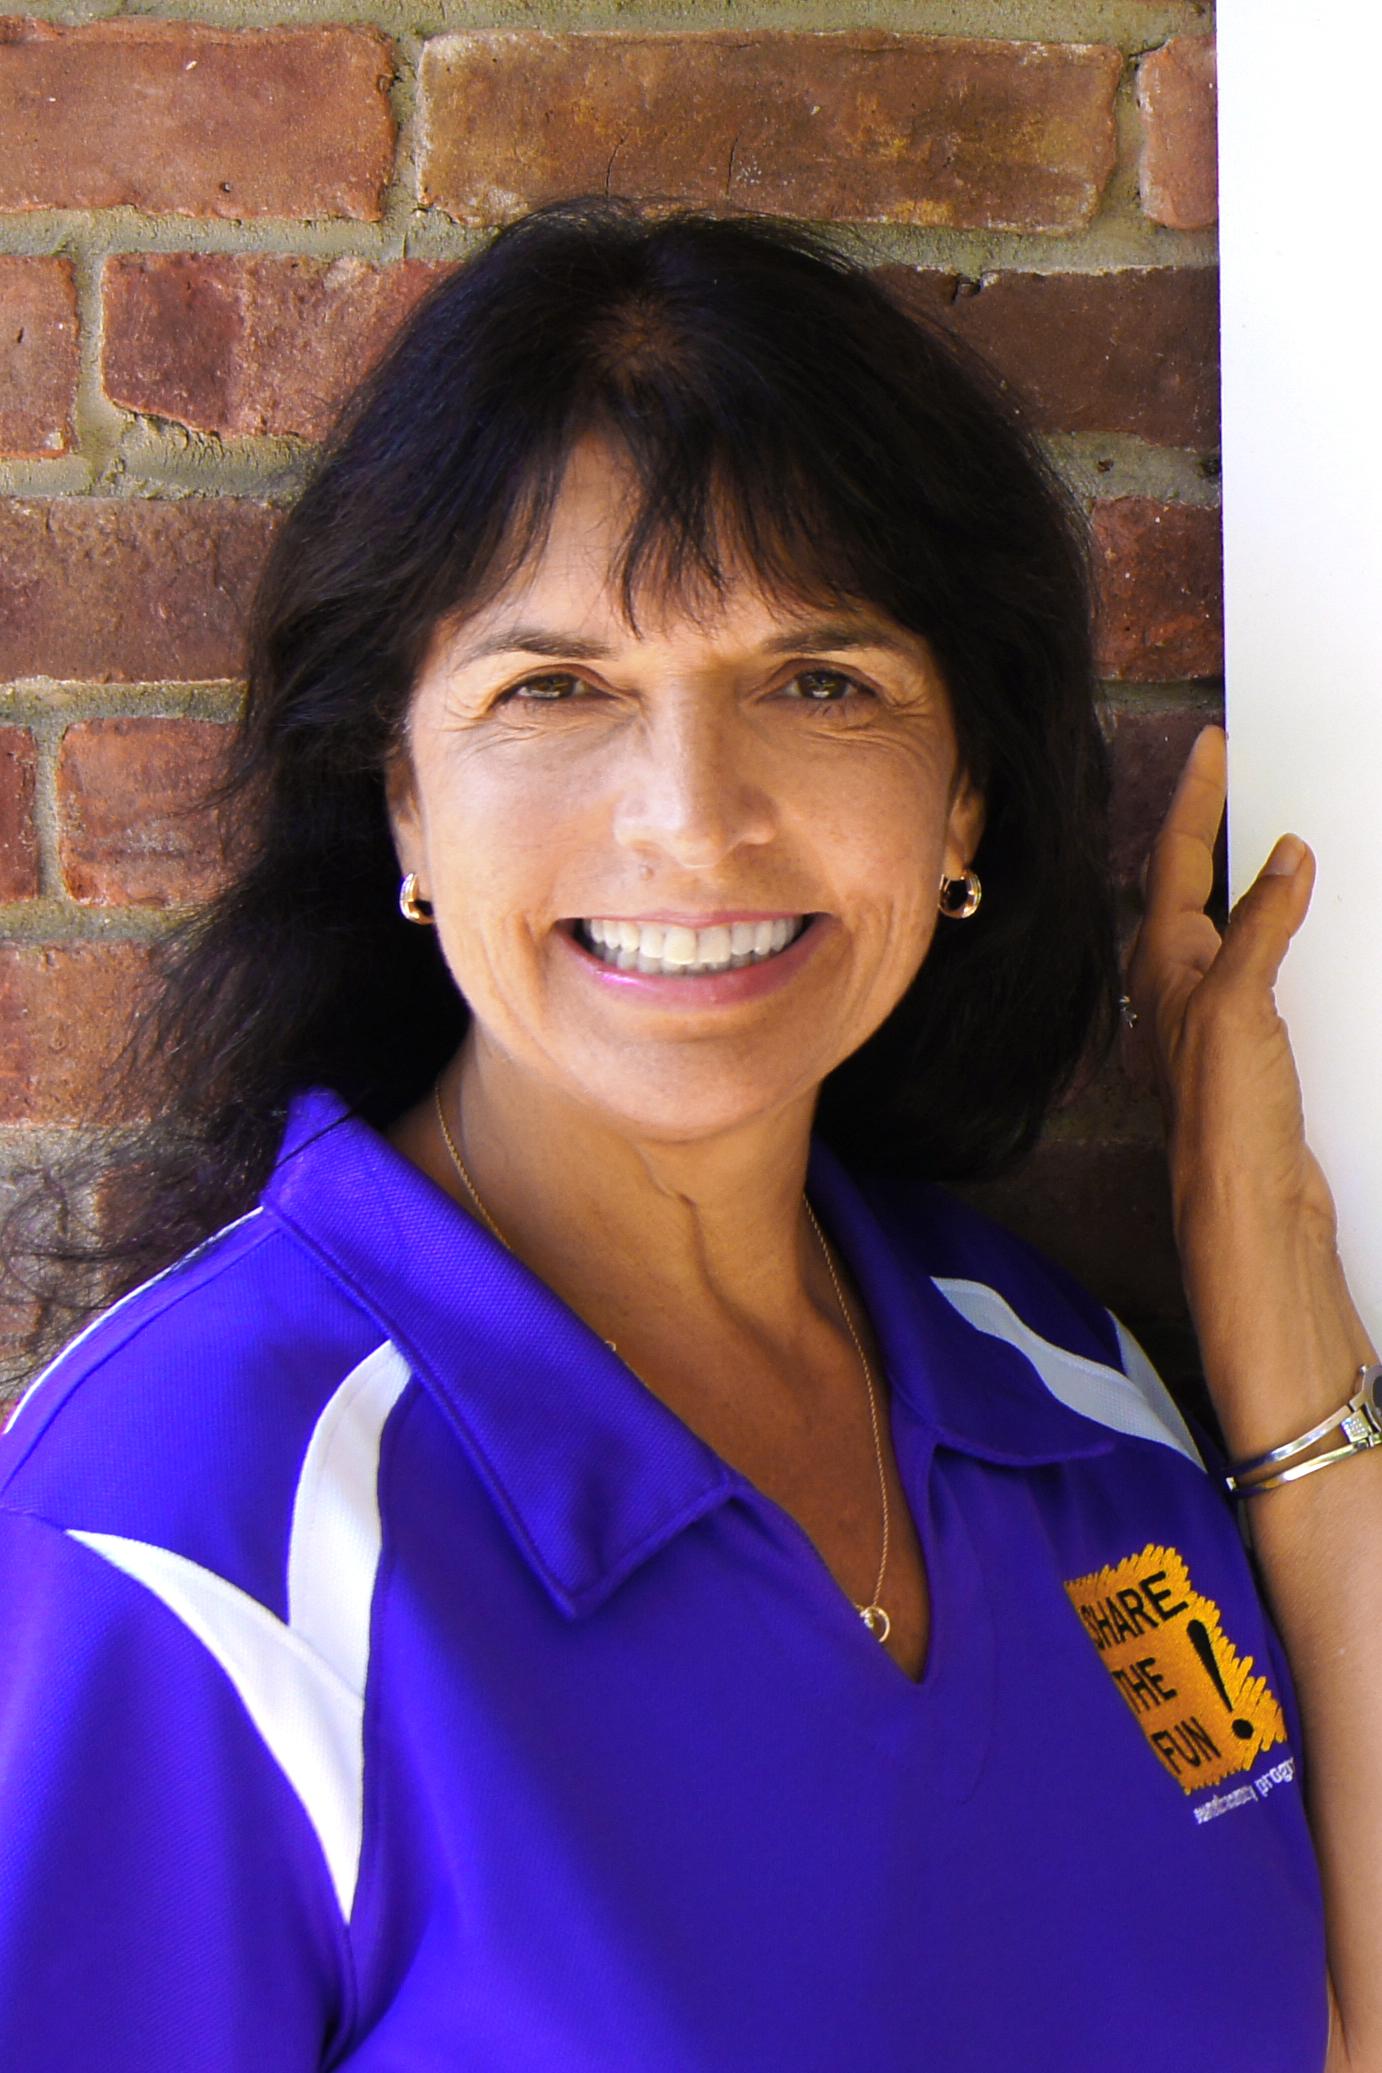 Judith Leblein-Josephs Headshot.jpg